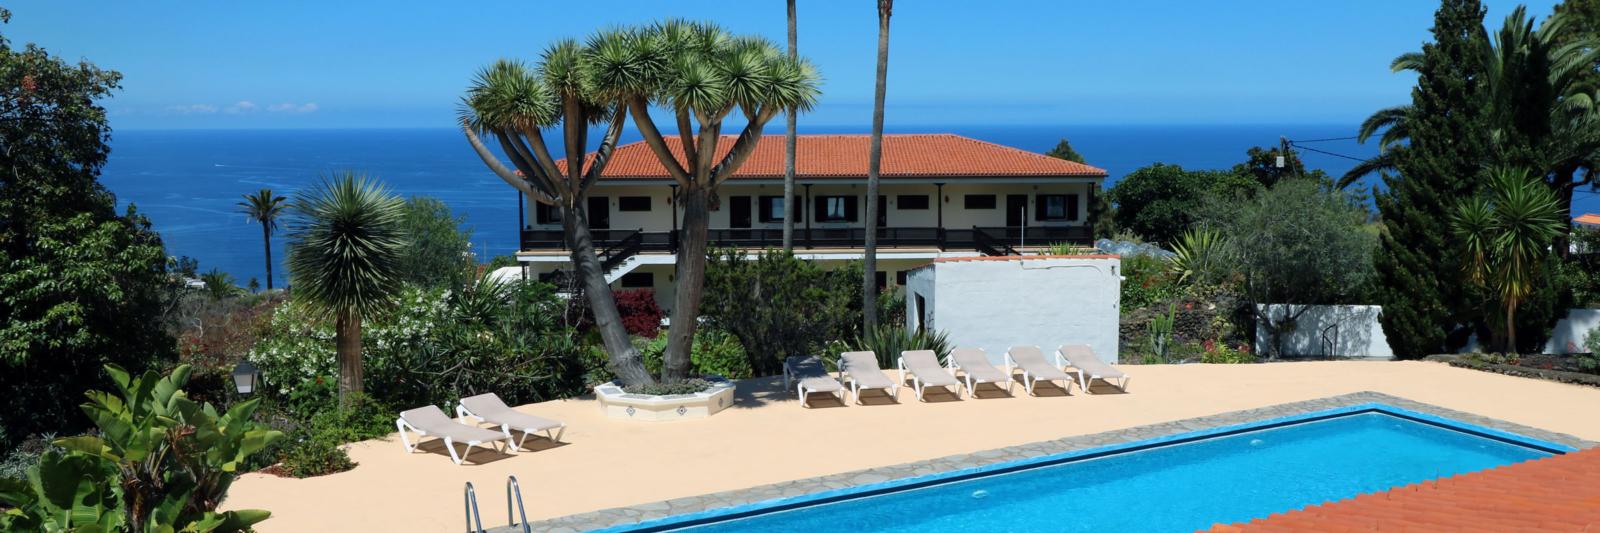 La Palma - Apartamentos Miranda - Main view